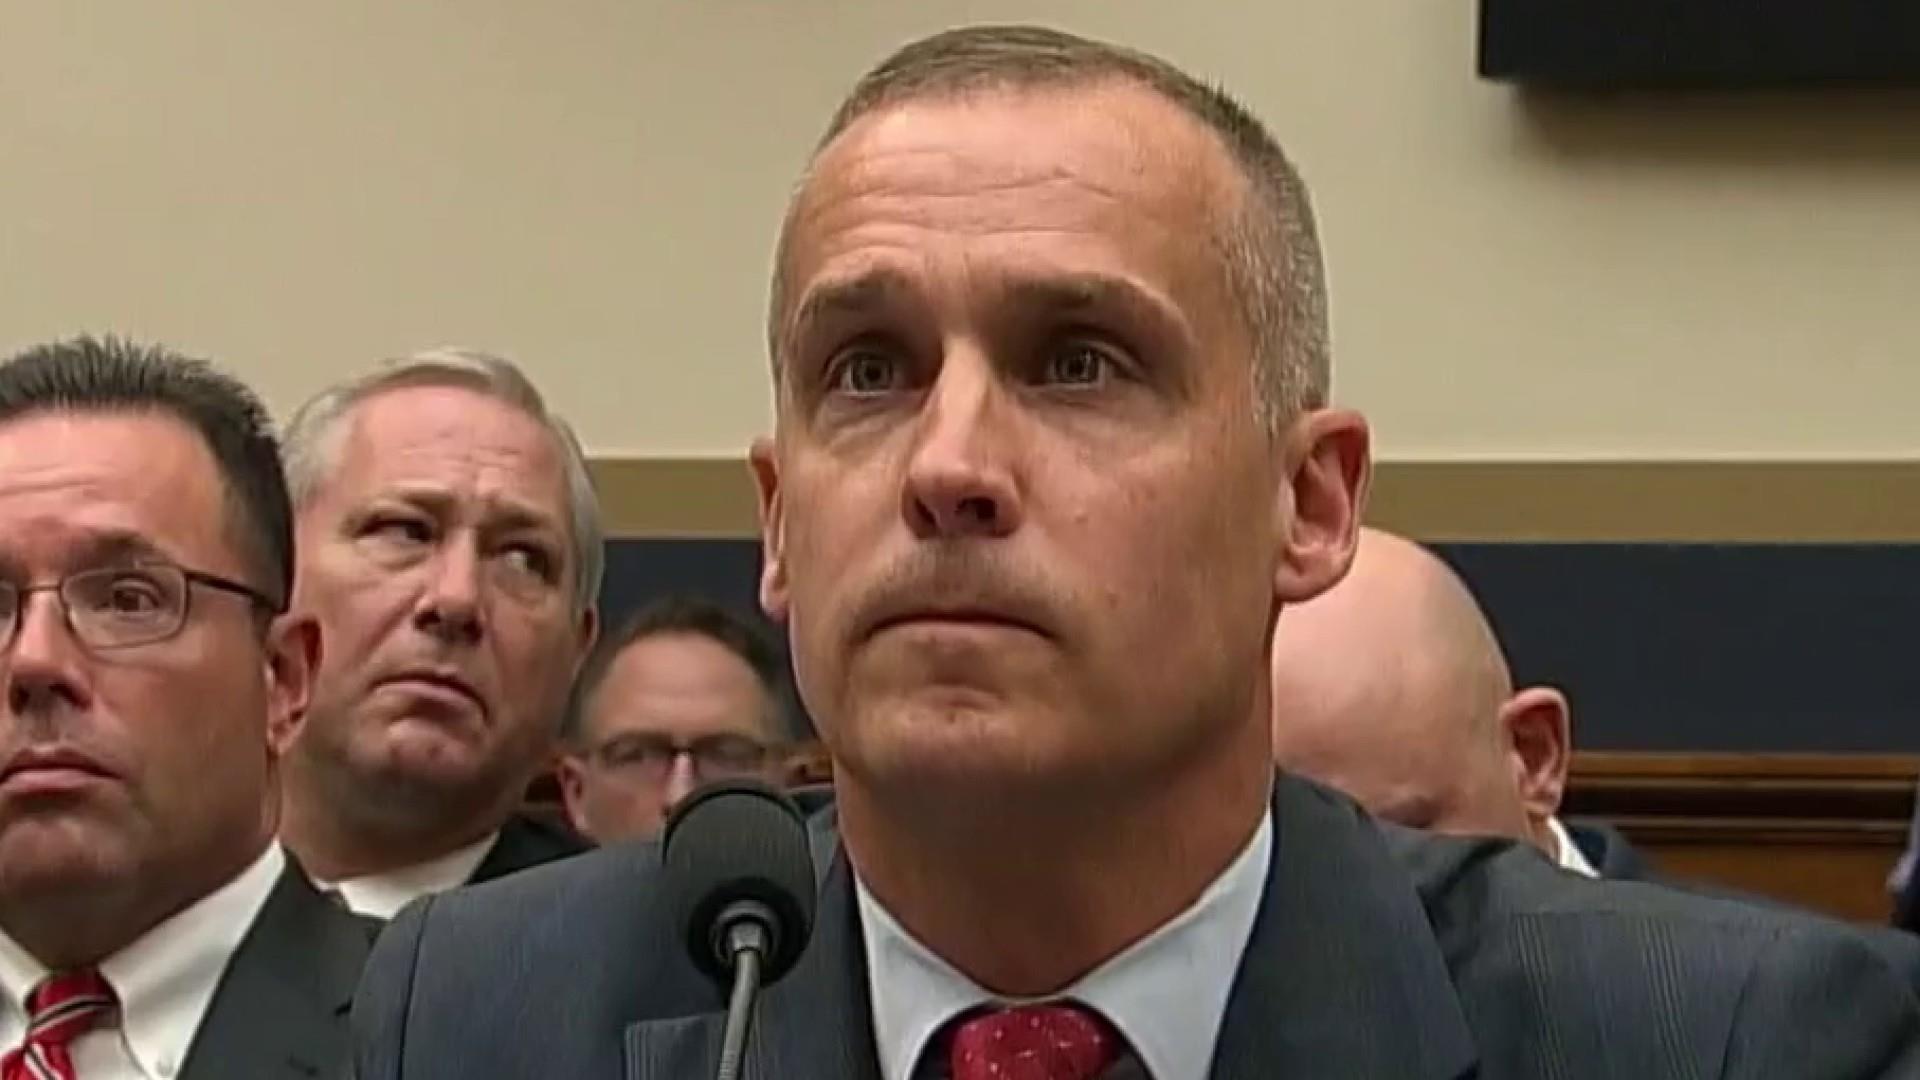 Combative Lewandowski begrudgingly affirms Mueller report's truth